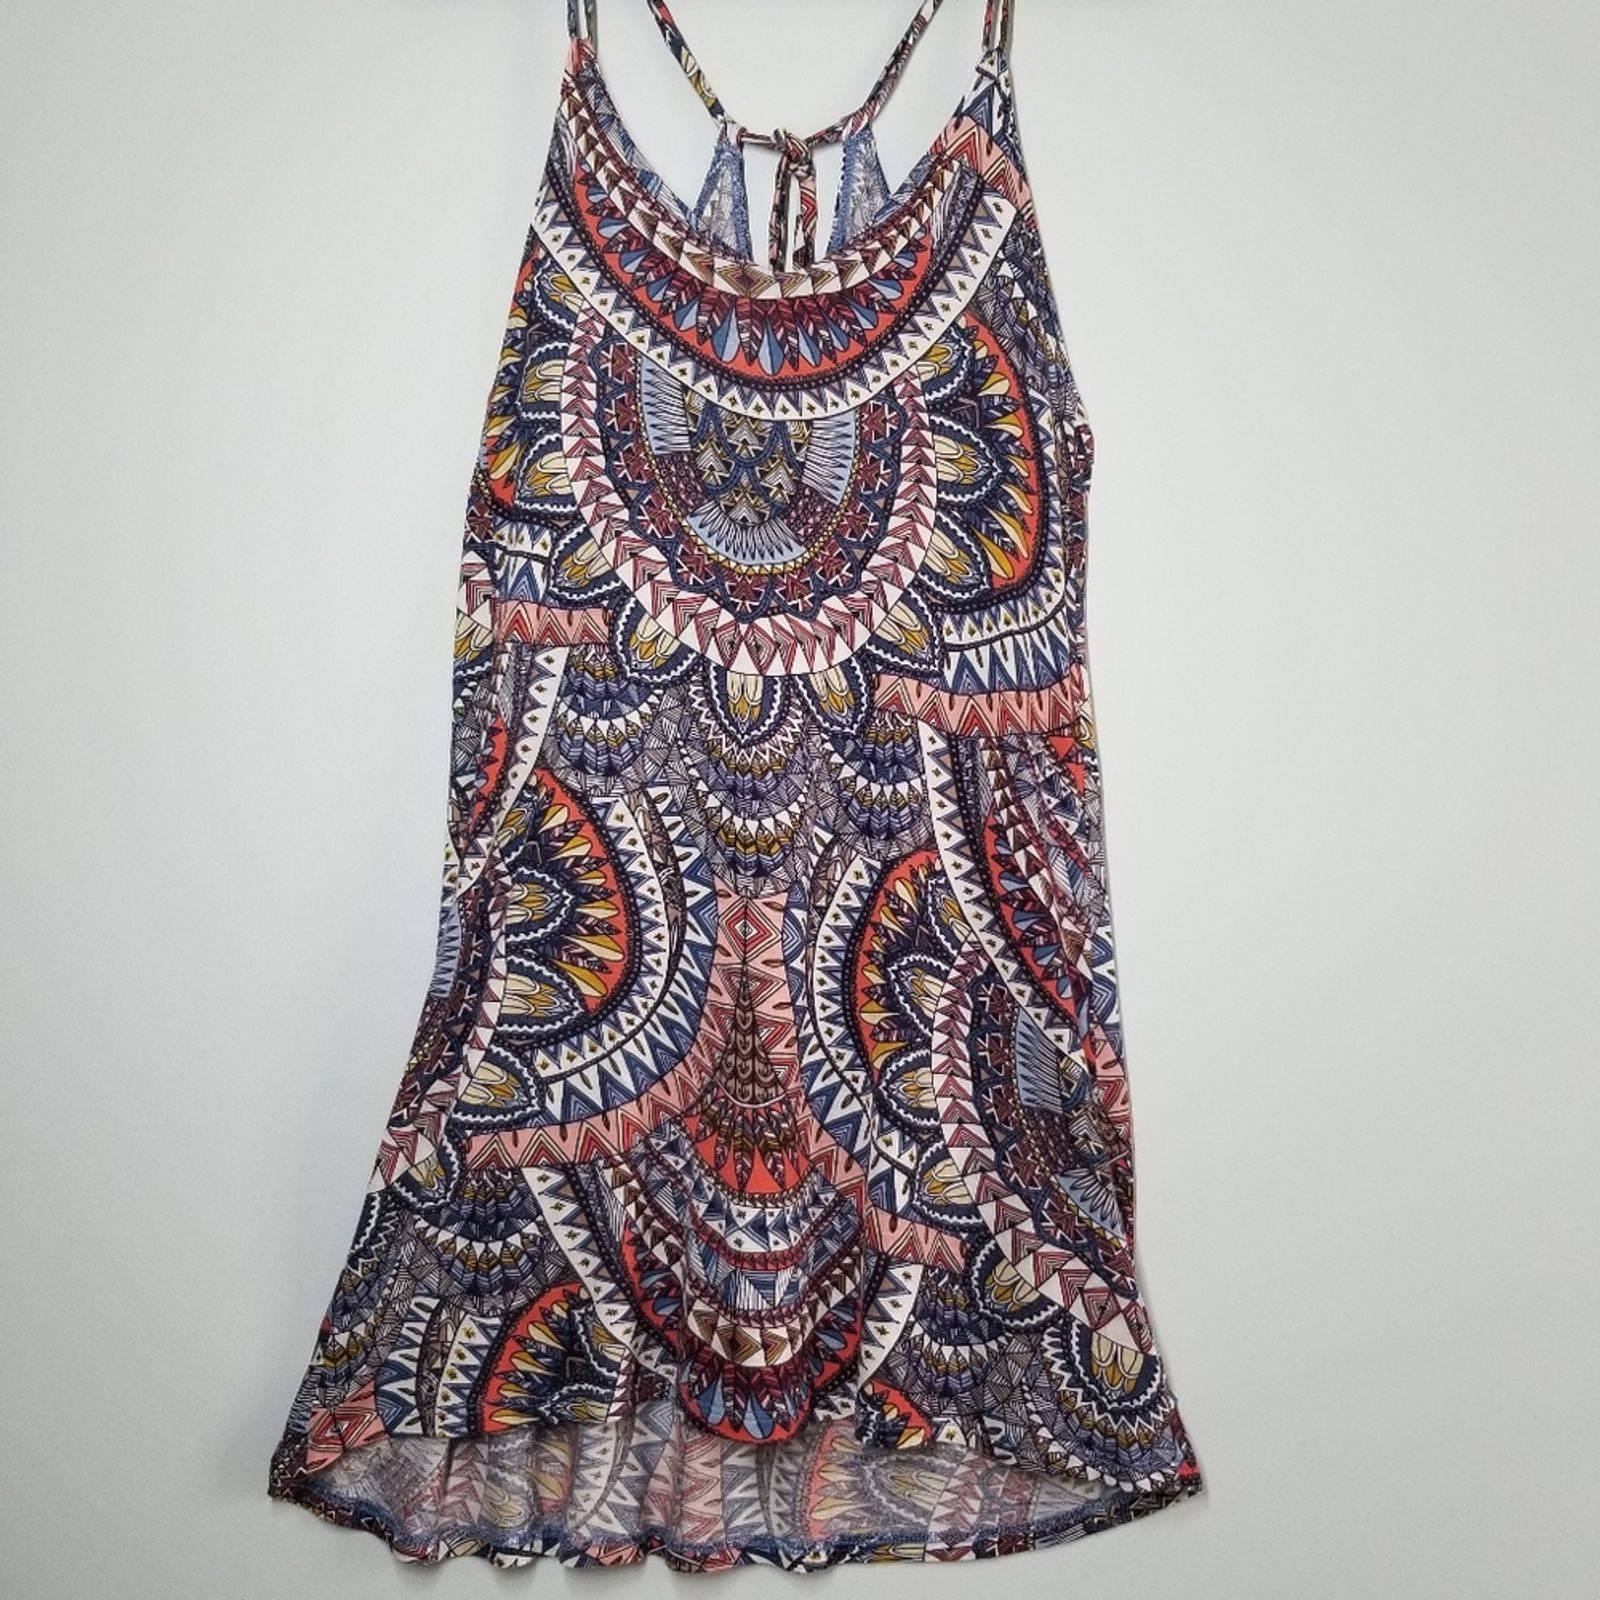 Billabong swimsuit coverup size XS